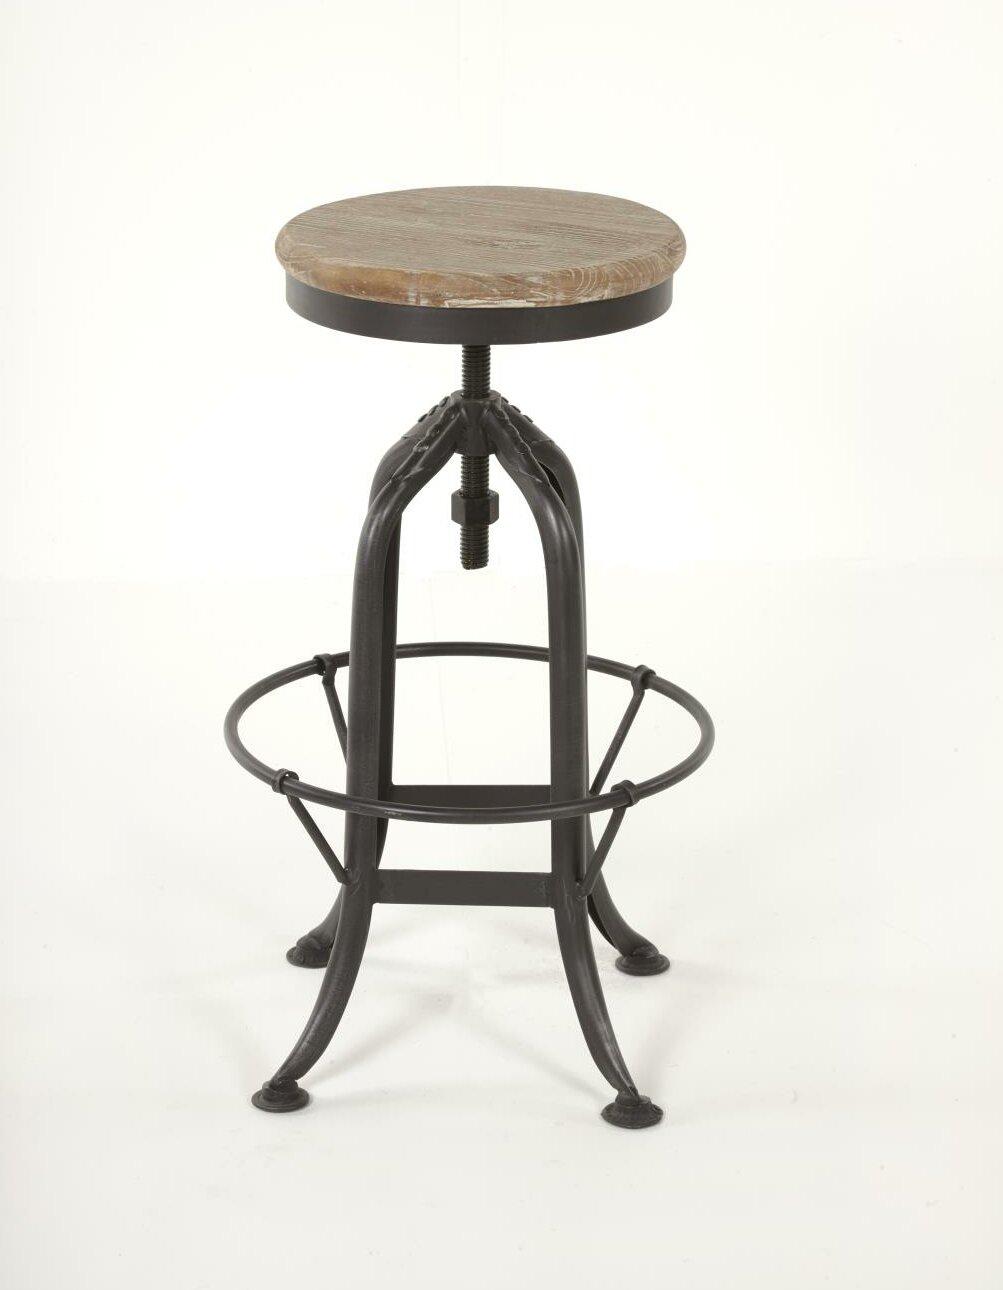 Strange Ramsell Iron Adjustable Height Swivel Bar Stool Beatyapartments Chair Design Images Beatyapartmentscom